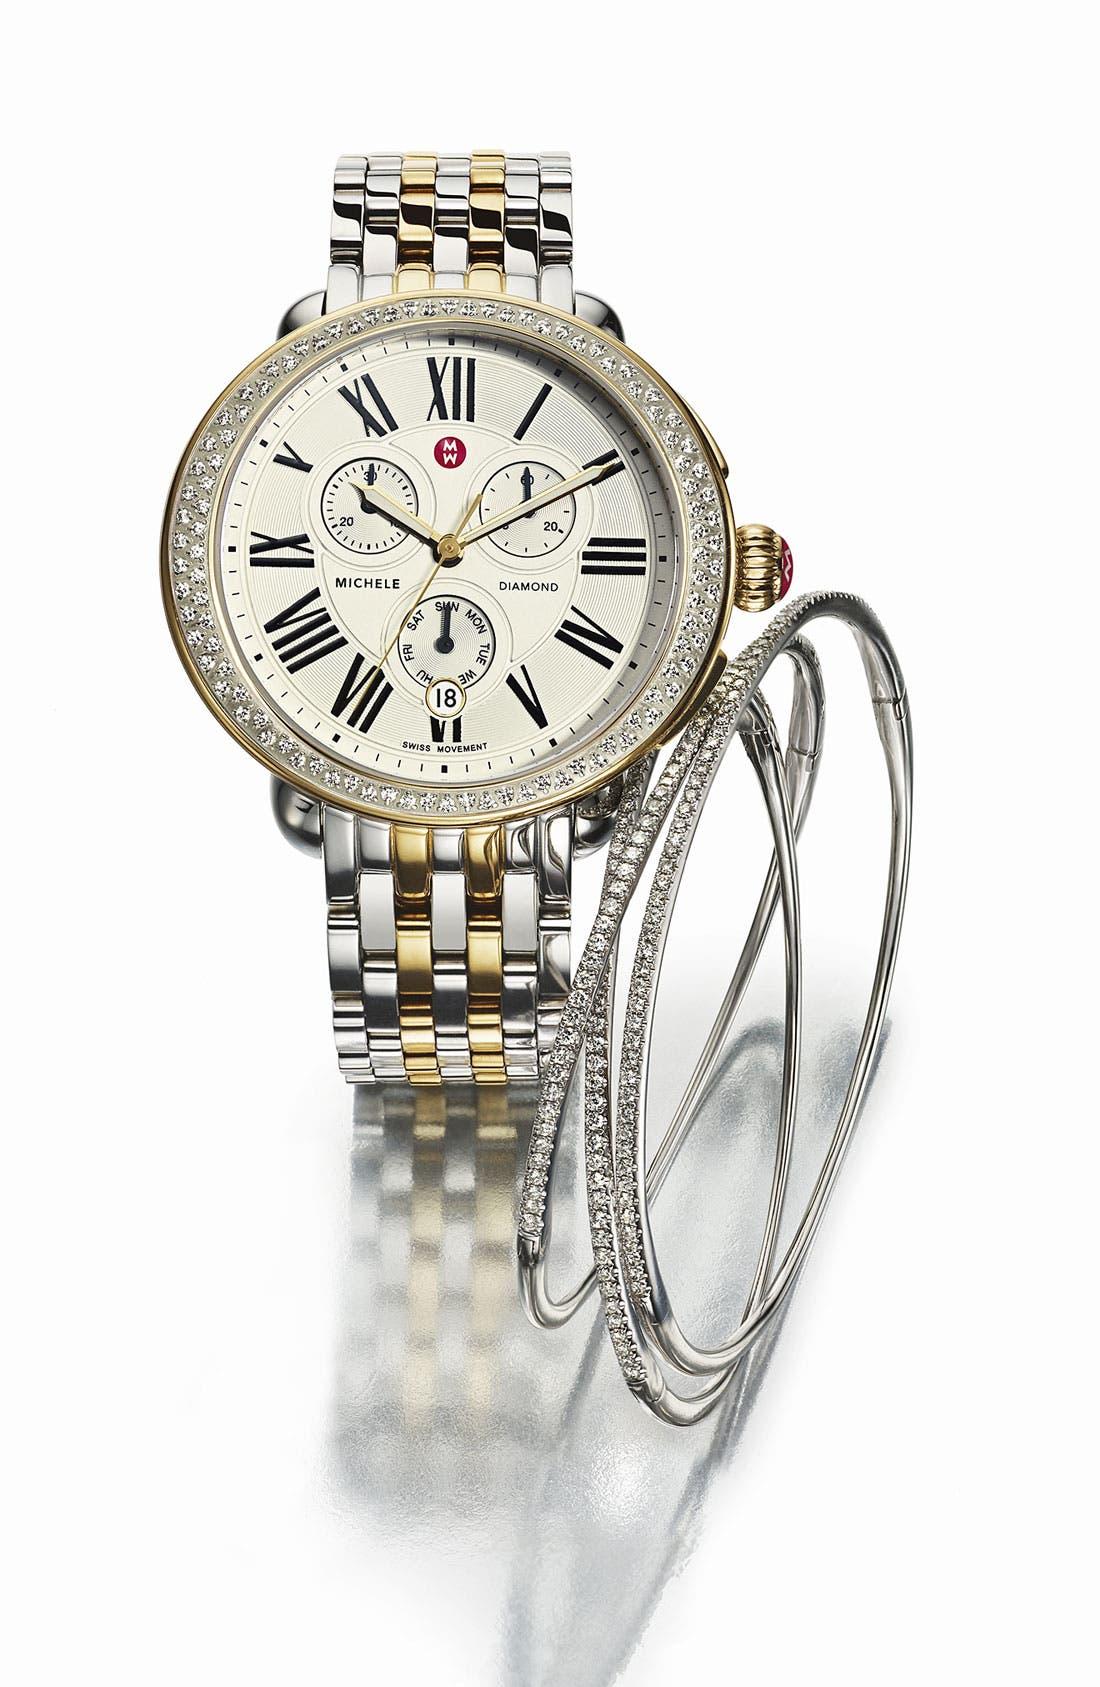 Main Image - MICHELE 'Serein' Diamond Two-Tone Watch Case & 18mm Bracelet